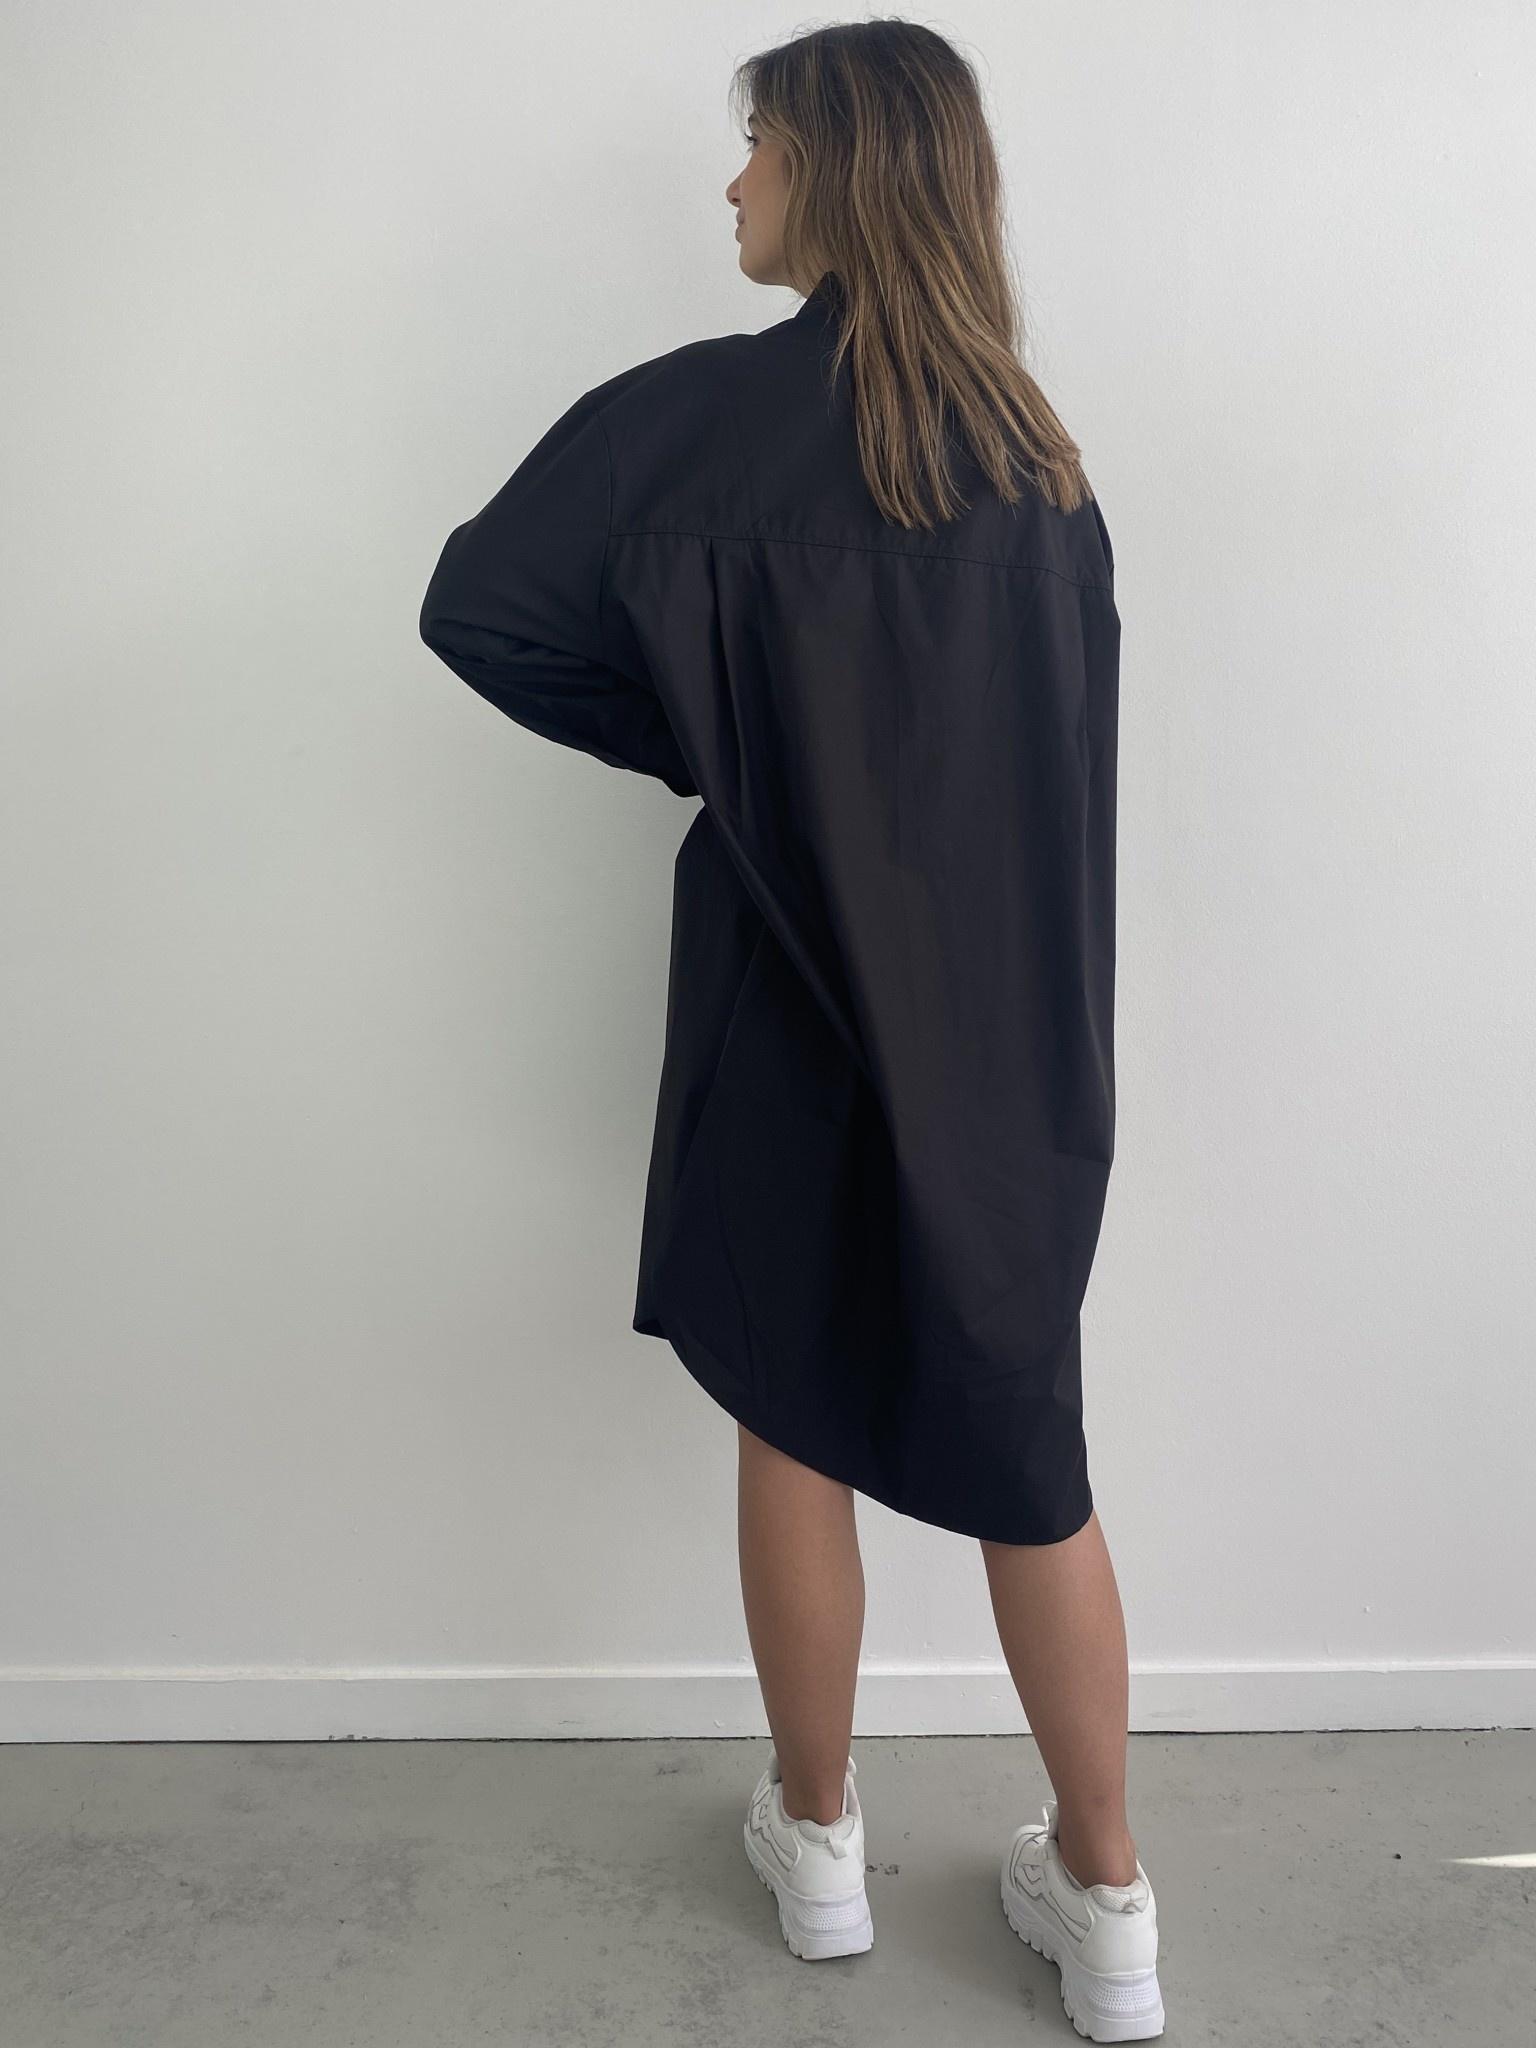 Andrea oversized shirt Black-4